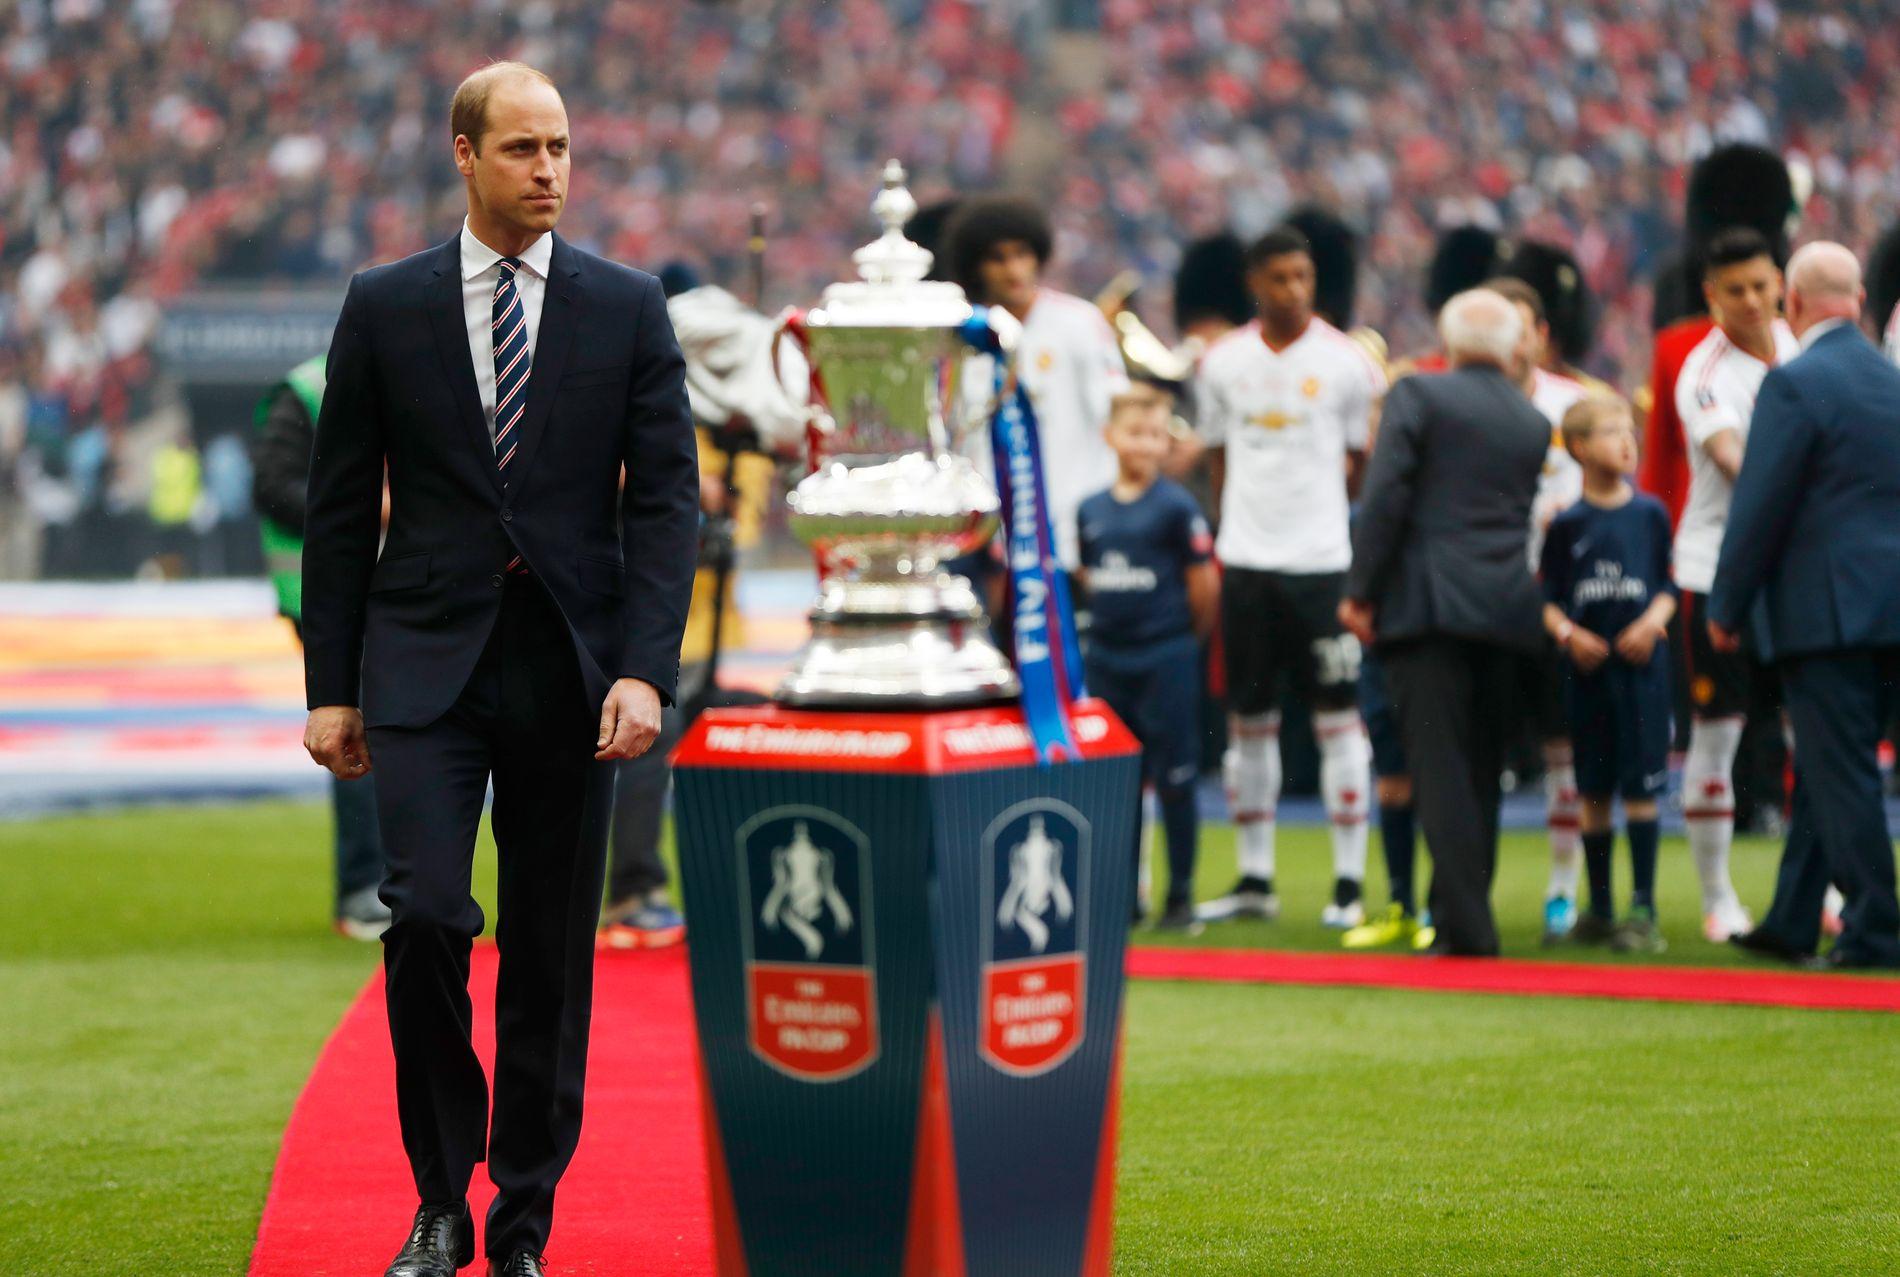 FOTBALLFRELST: Prins William, her fra FA-cupfinalen i 2016.